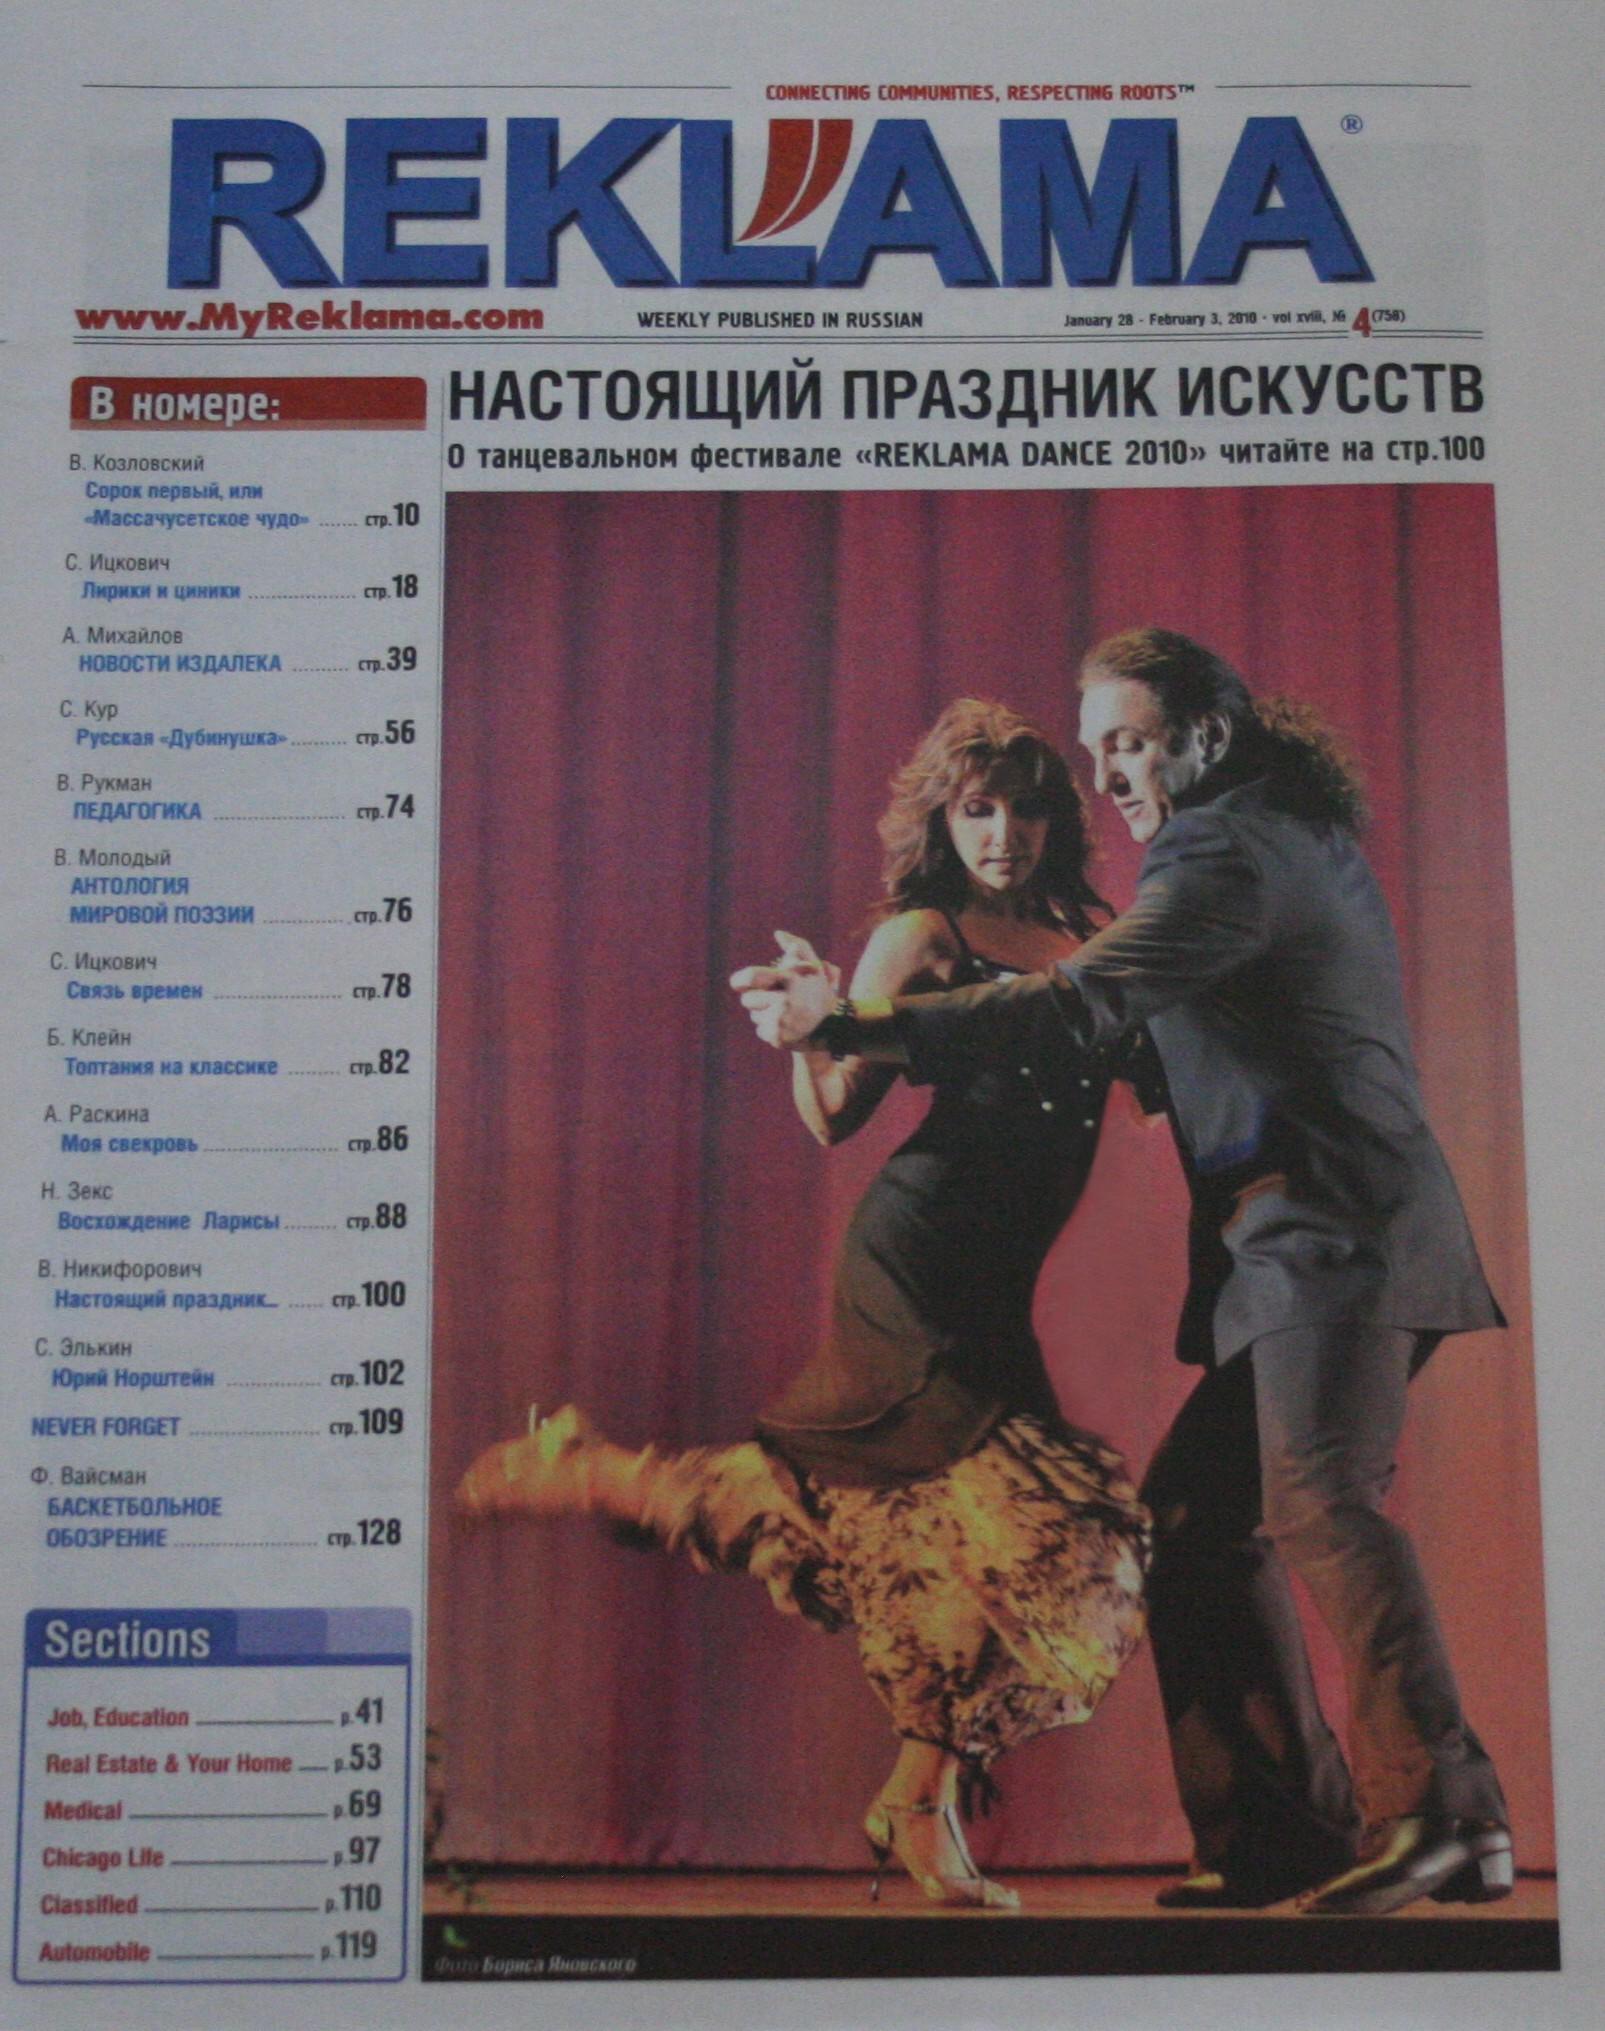 Grand Prix_Reklama Dance 2010.jpg